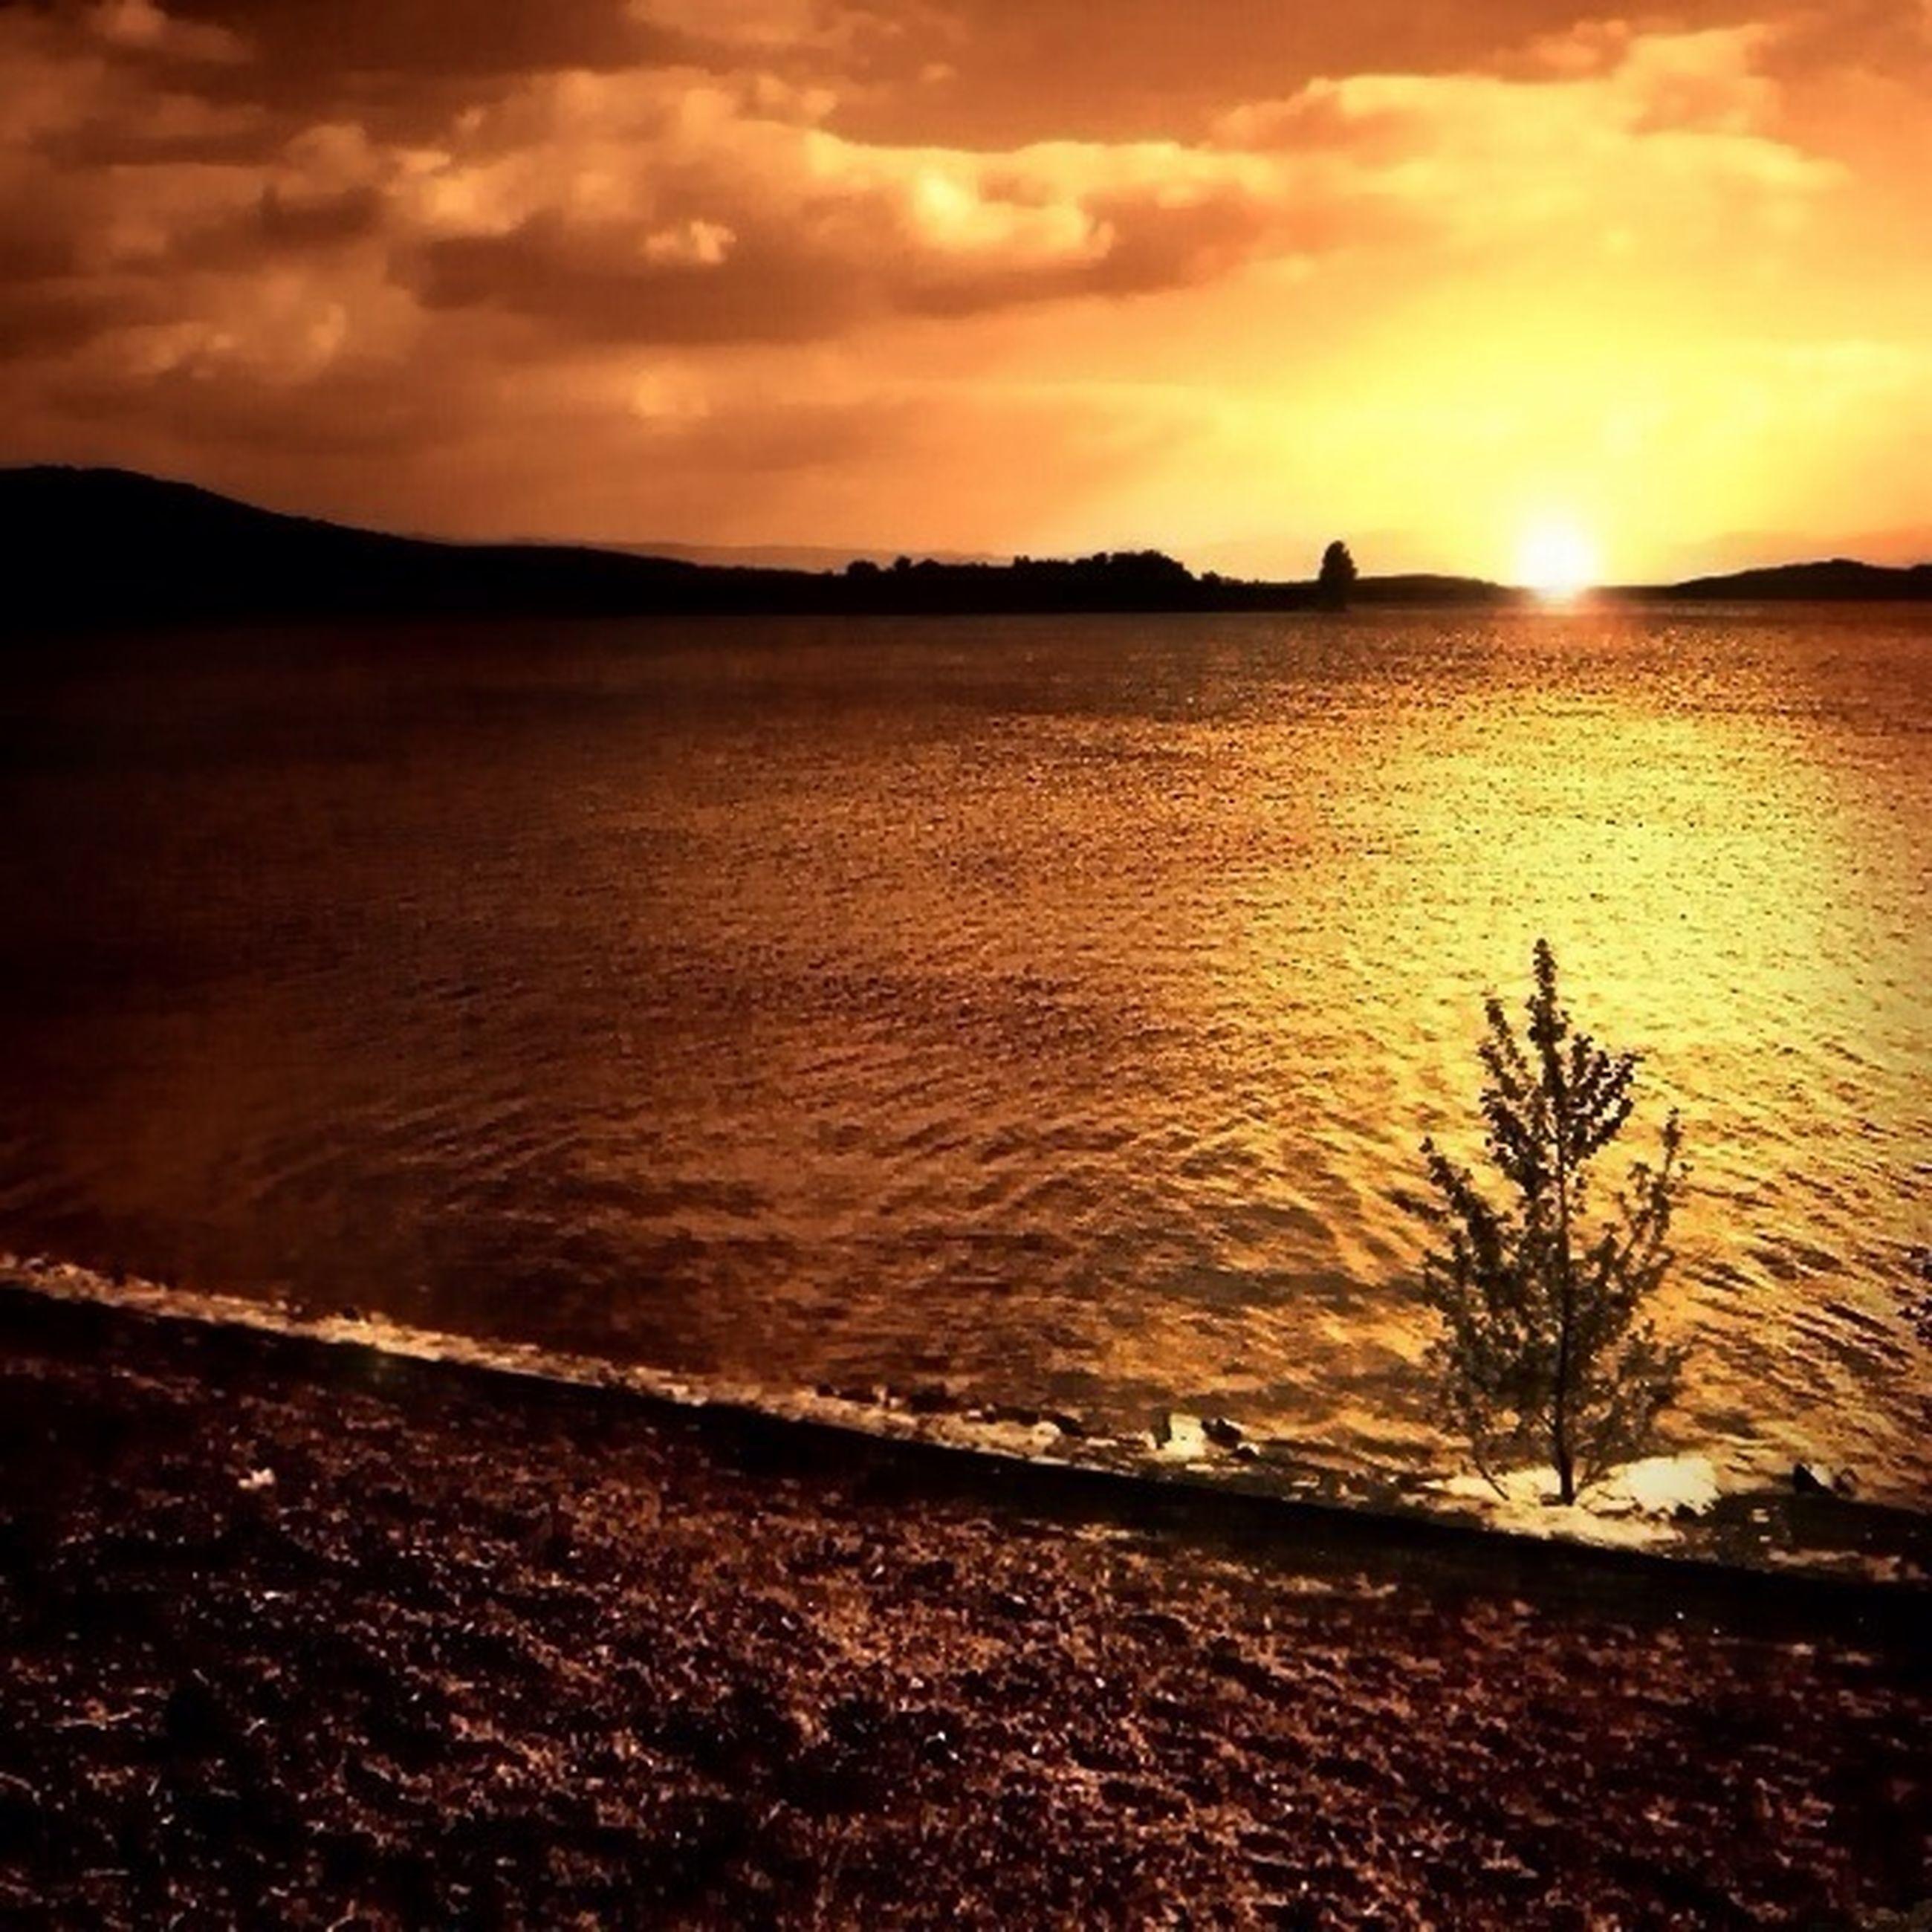 sunset, water, sky, tranquil scene, scenics, tranquility, beauty in nature, sun, orange color, cloud - sky, nature, idyllic, lake, reflection, sea, sunlight, cloud, silhouette, river, non-urban scene